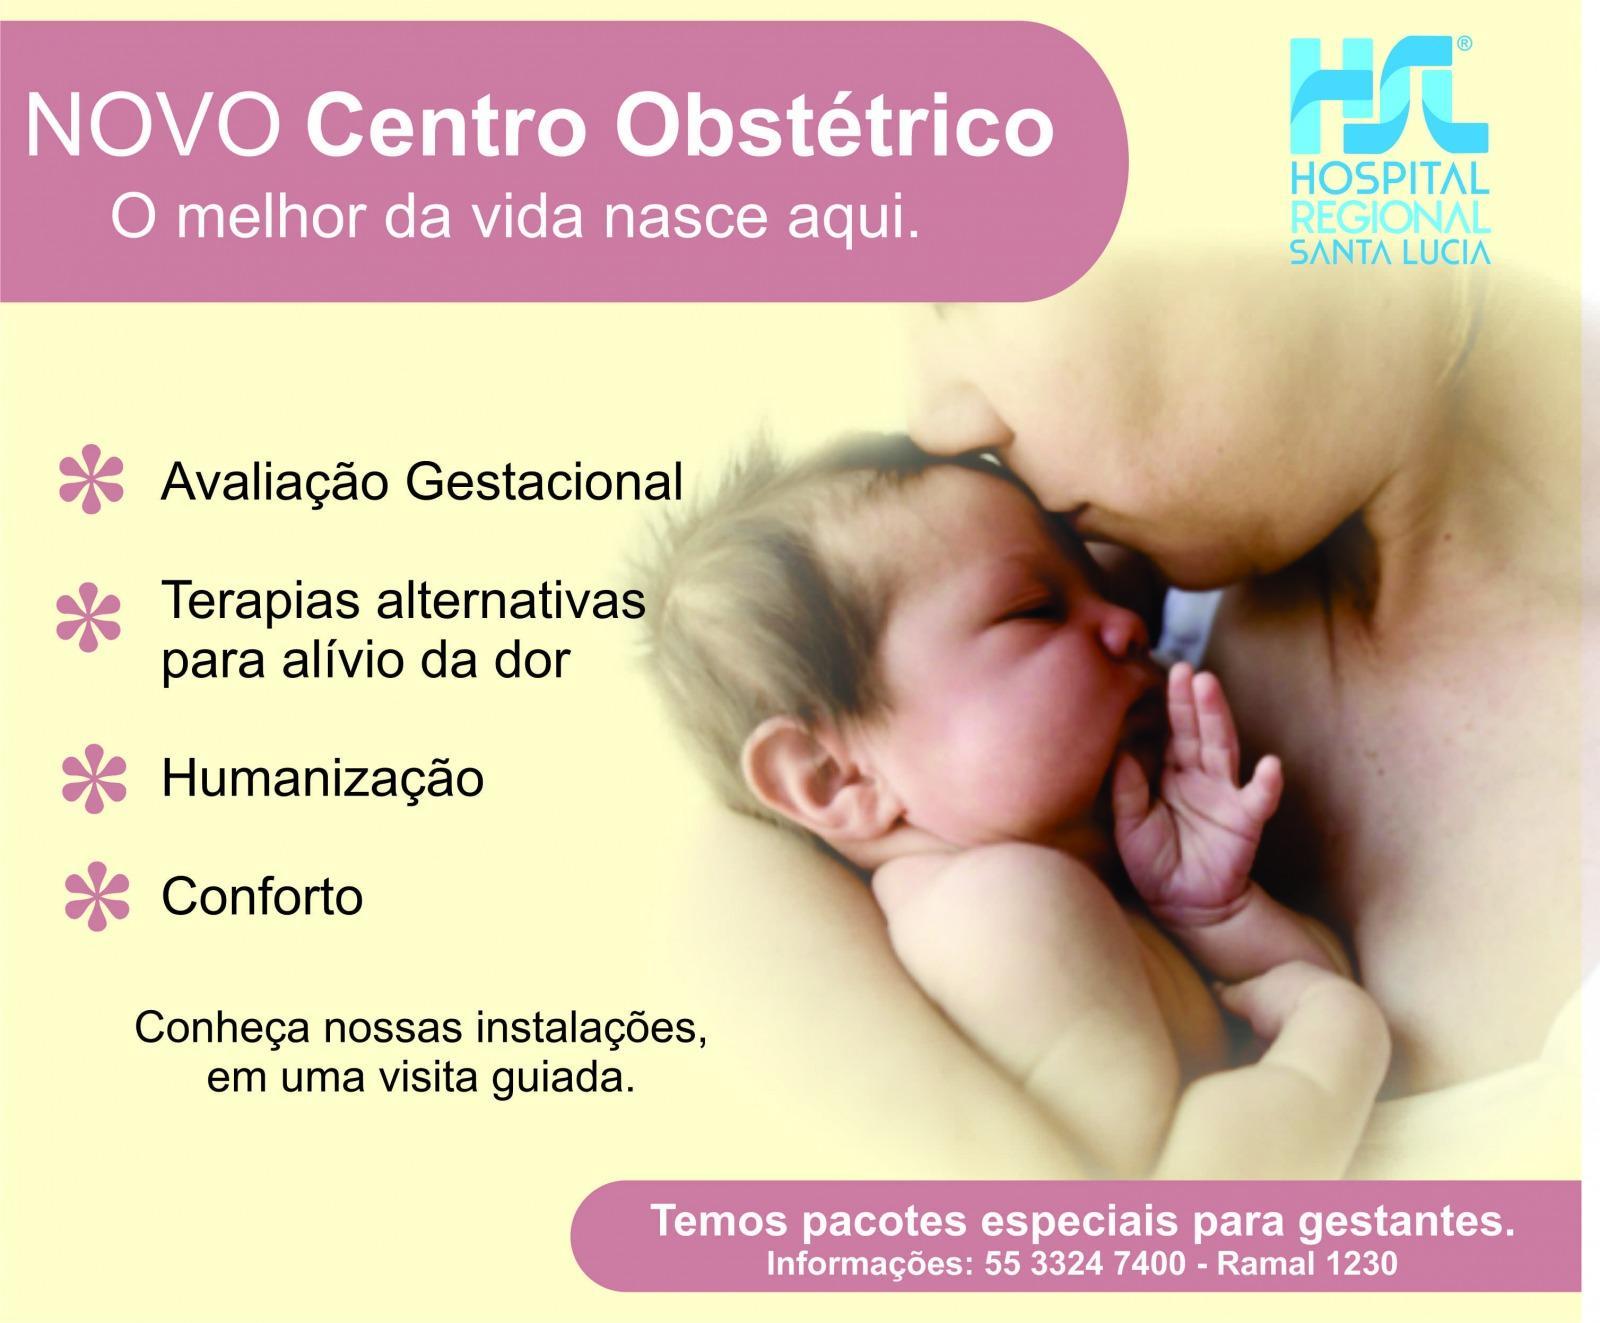 Novo Centro Obstétrico